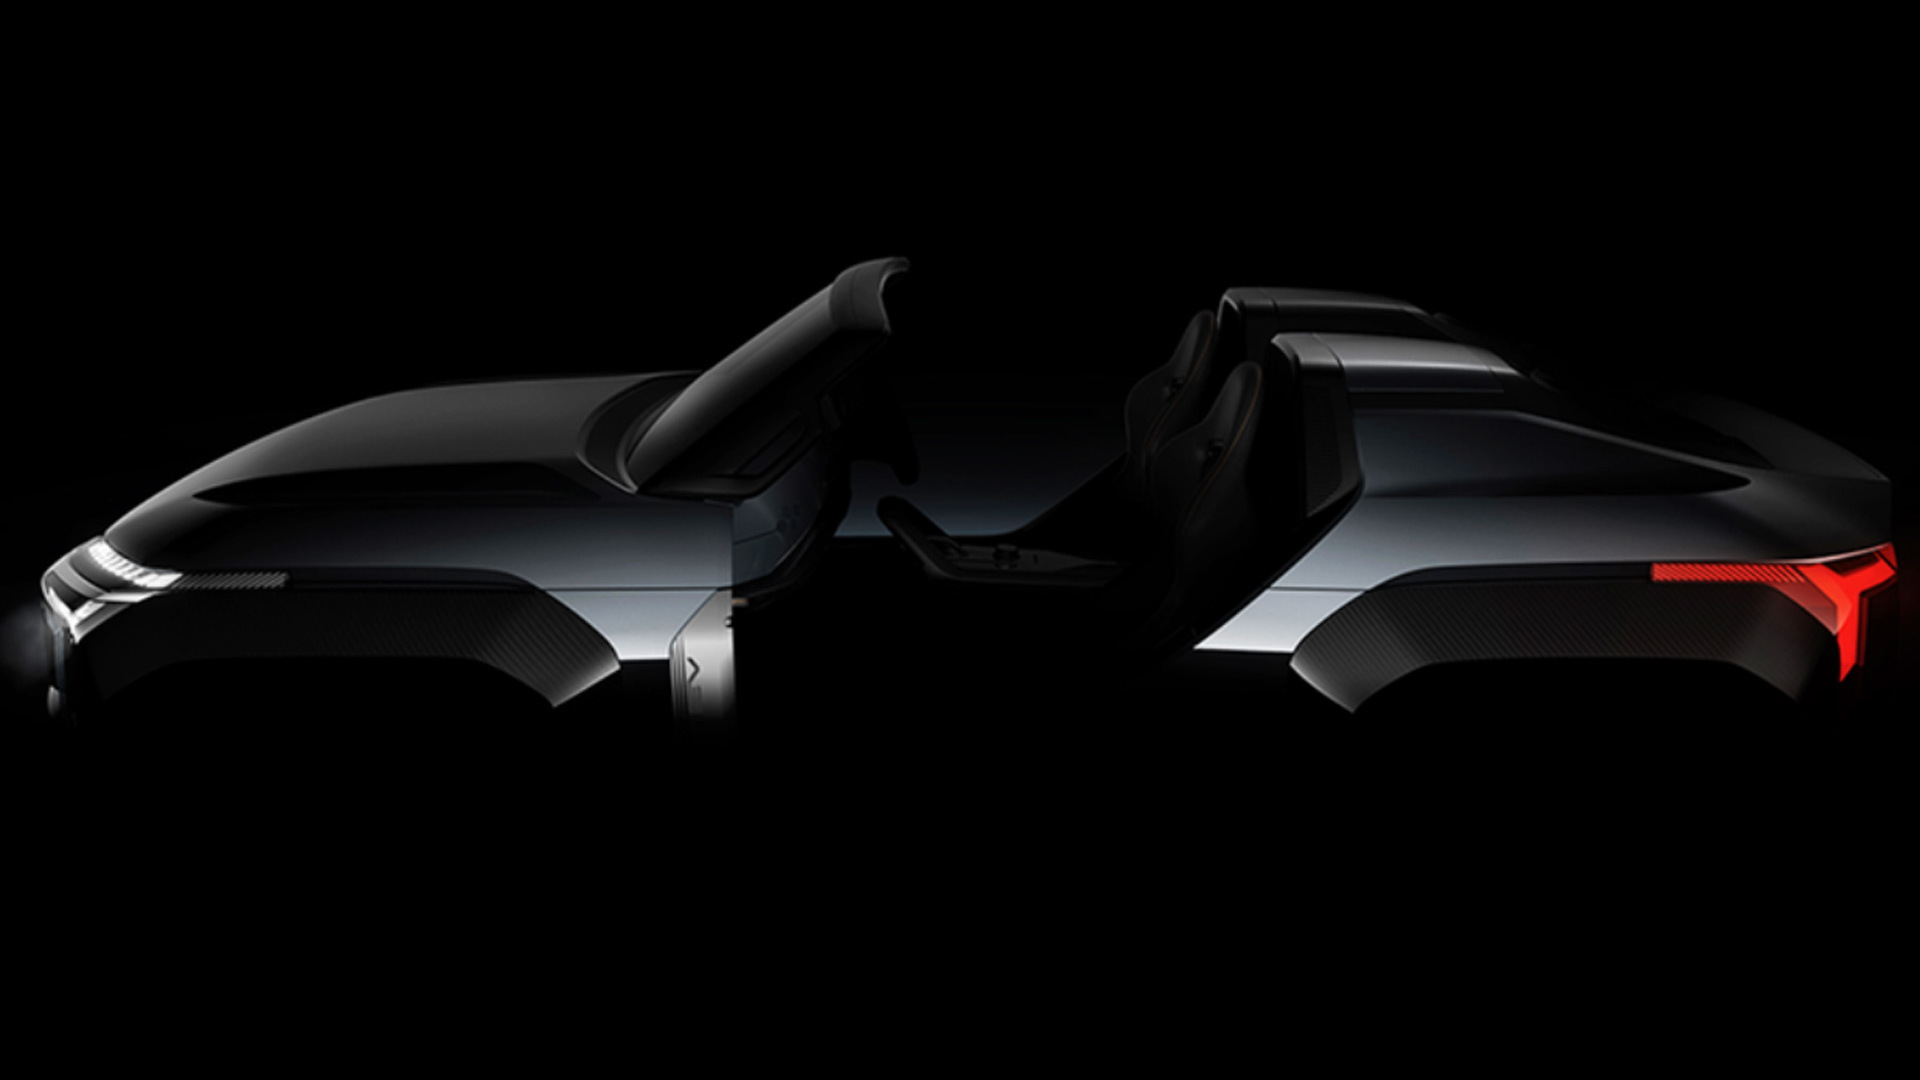 Teaser for Mitsubishi MI-TECH Concept debuting at 2019 Tokyo Motor Show